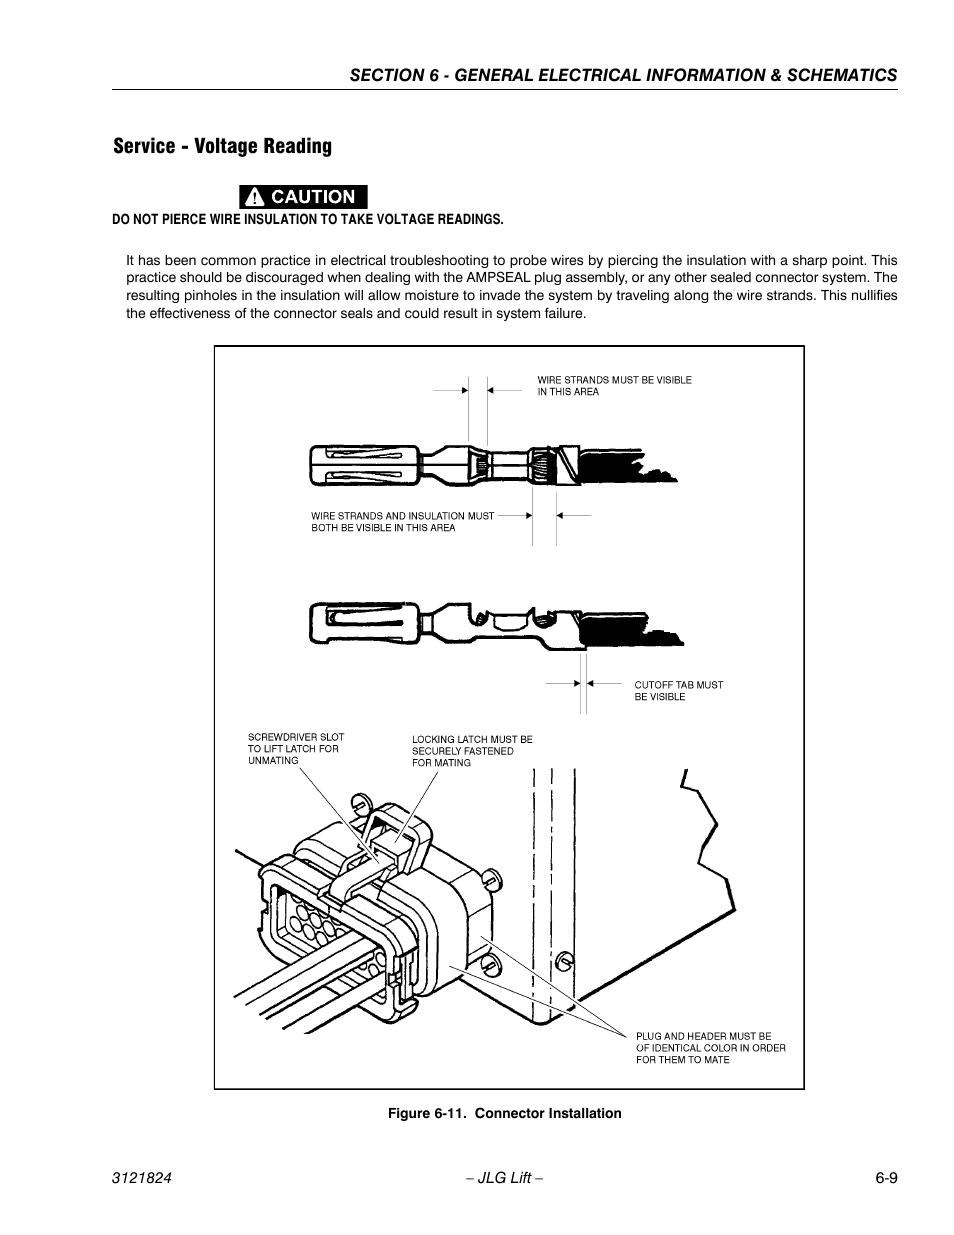 Jlg 3369le Wiring Diagram Schemes Service Voltage Reading Connector Installation 9 M4069 Altec